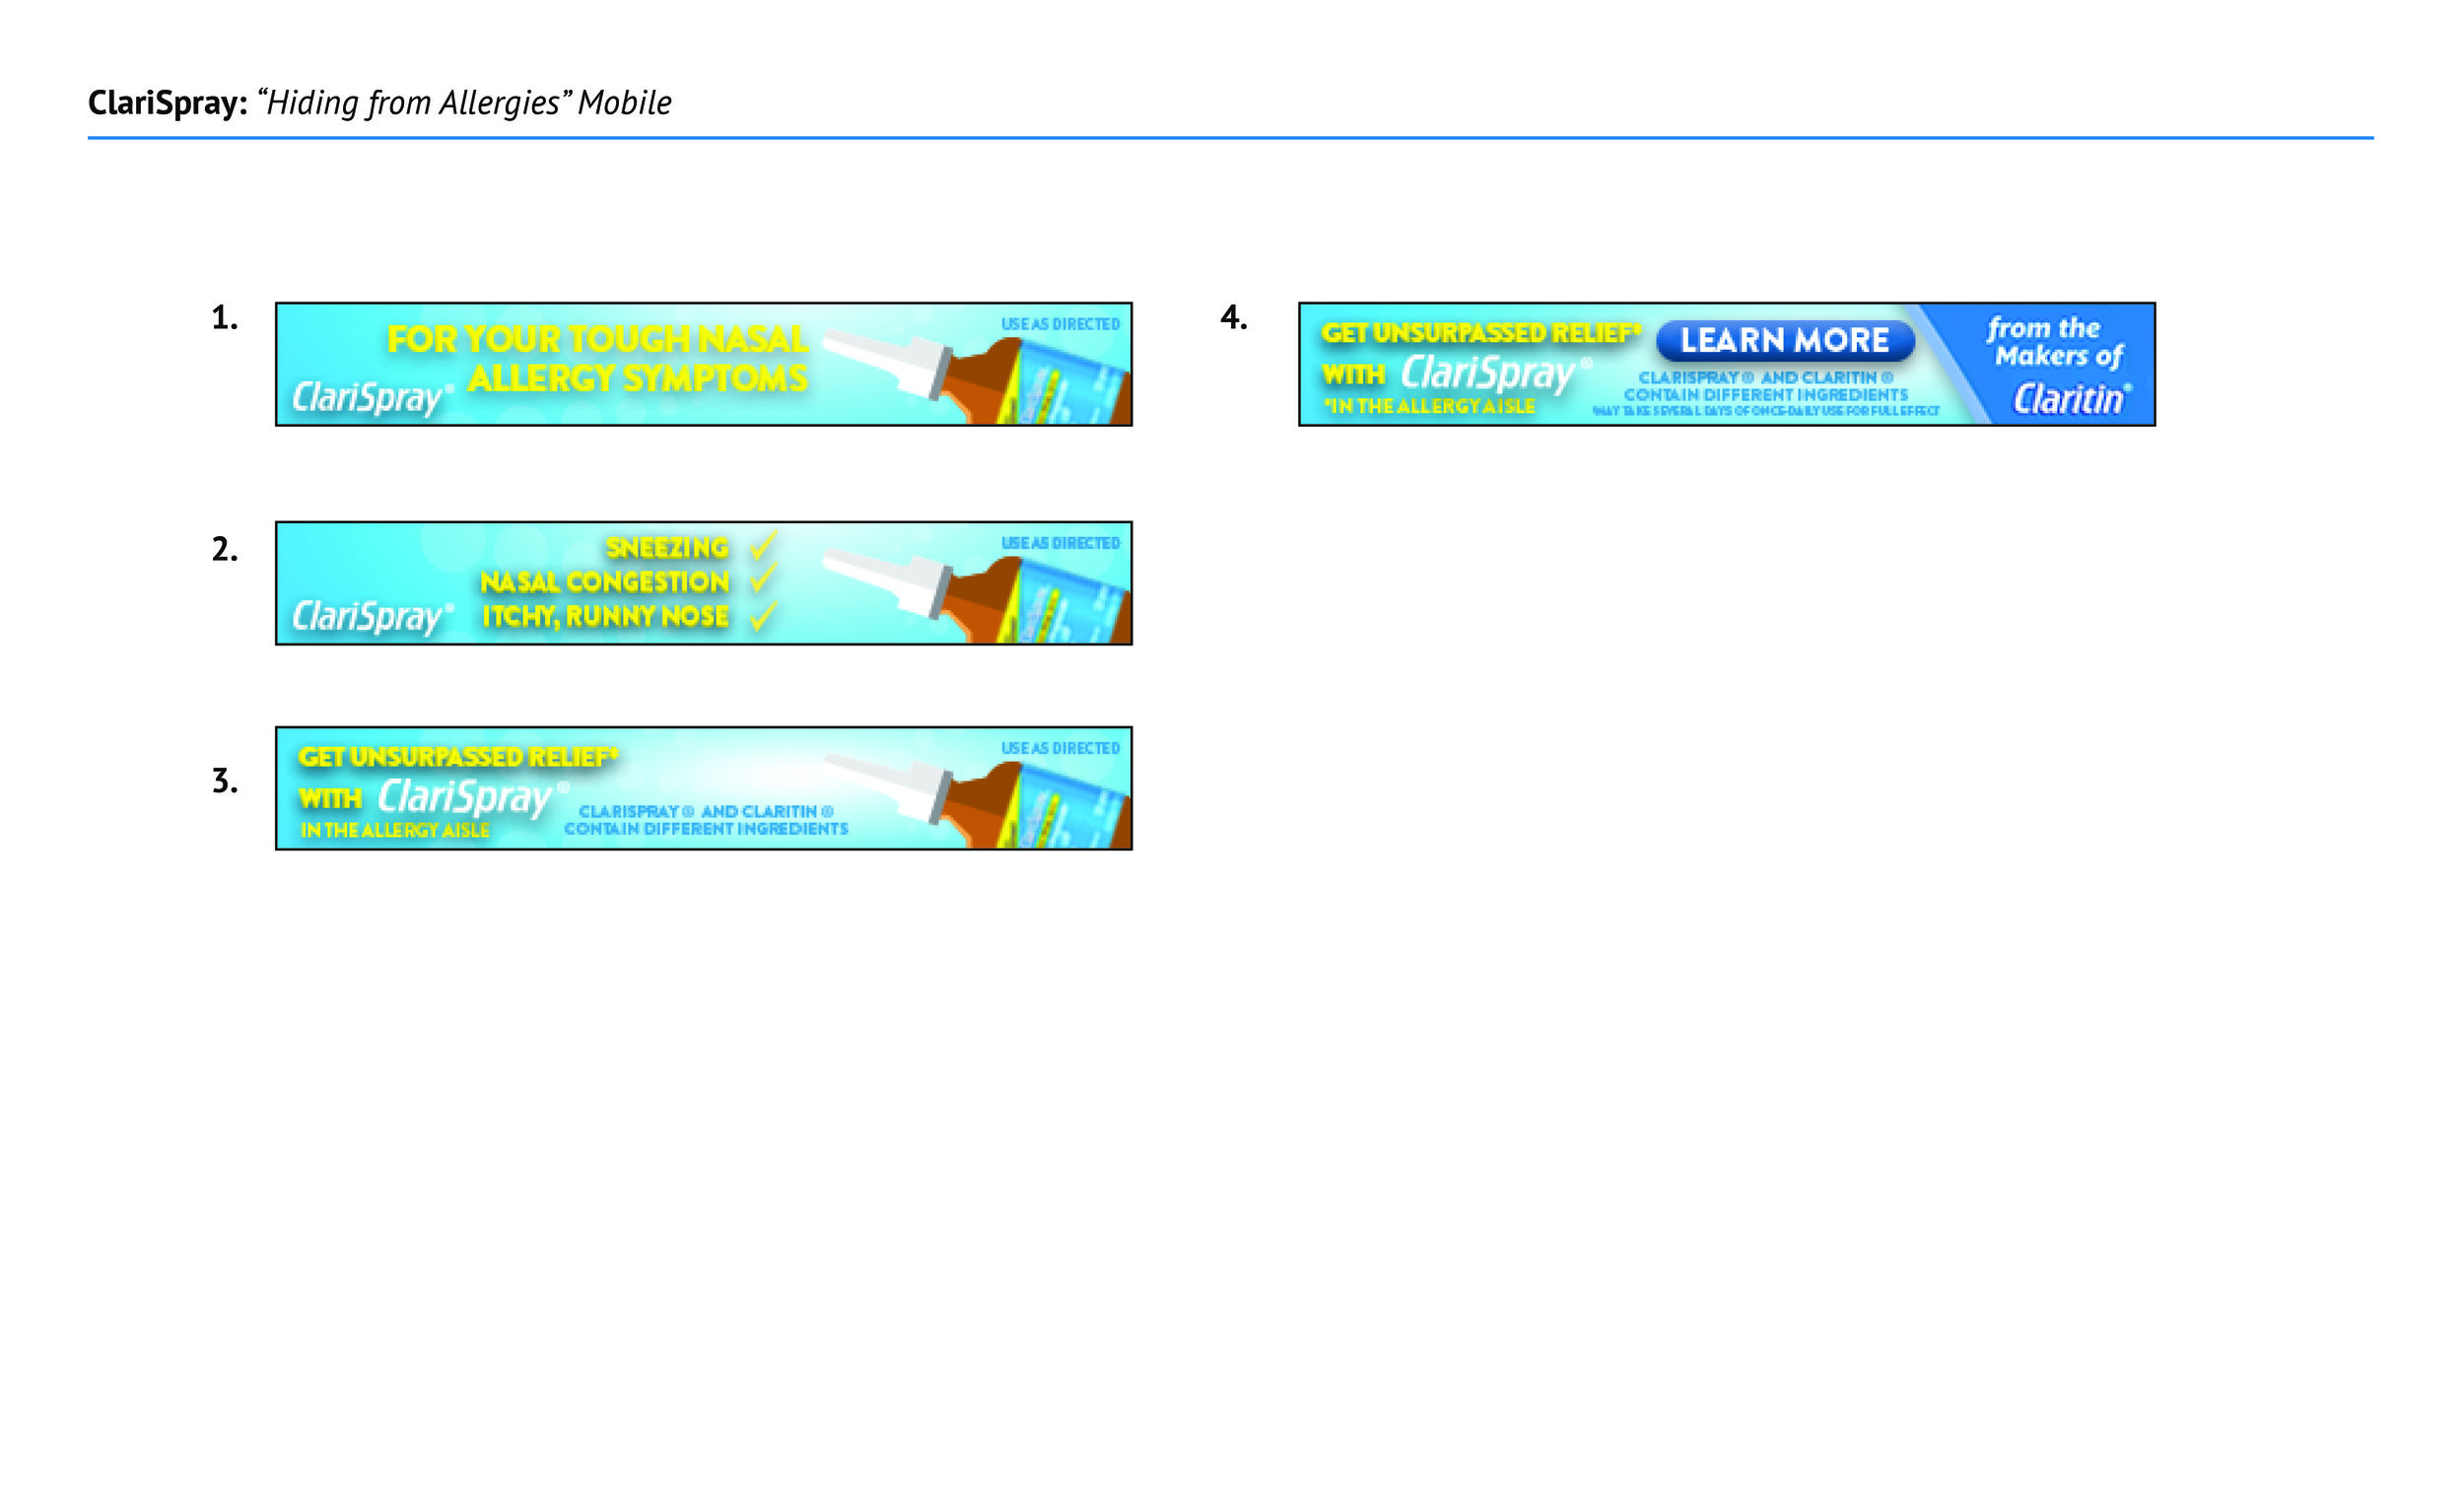 Clarispray-banners32.jpg